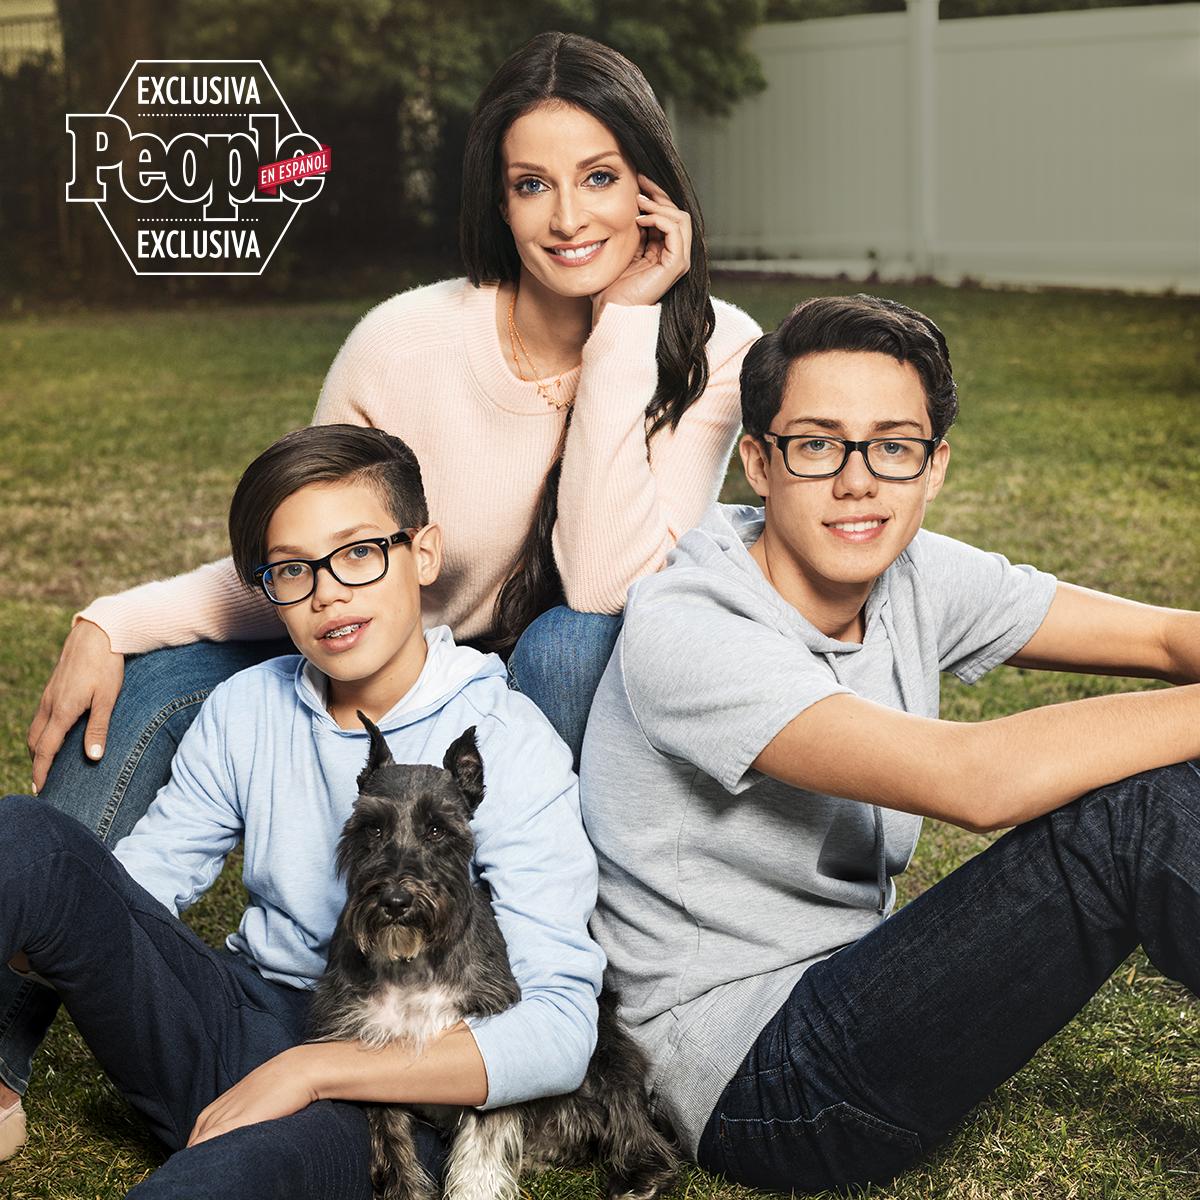 dayanara-with-kids-and-dog.jpg